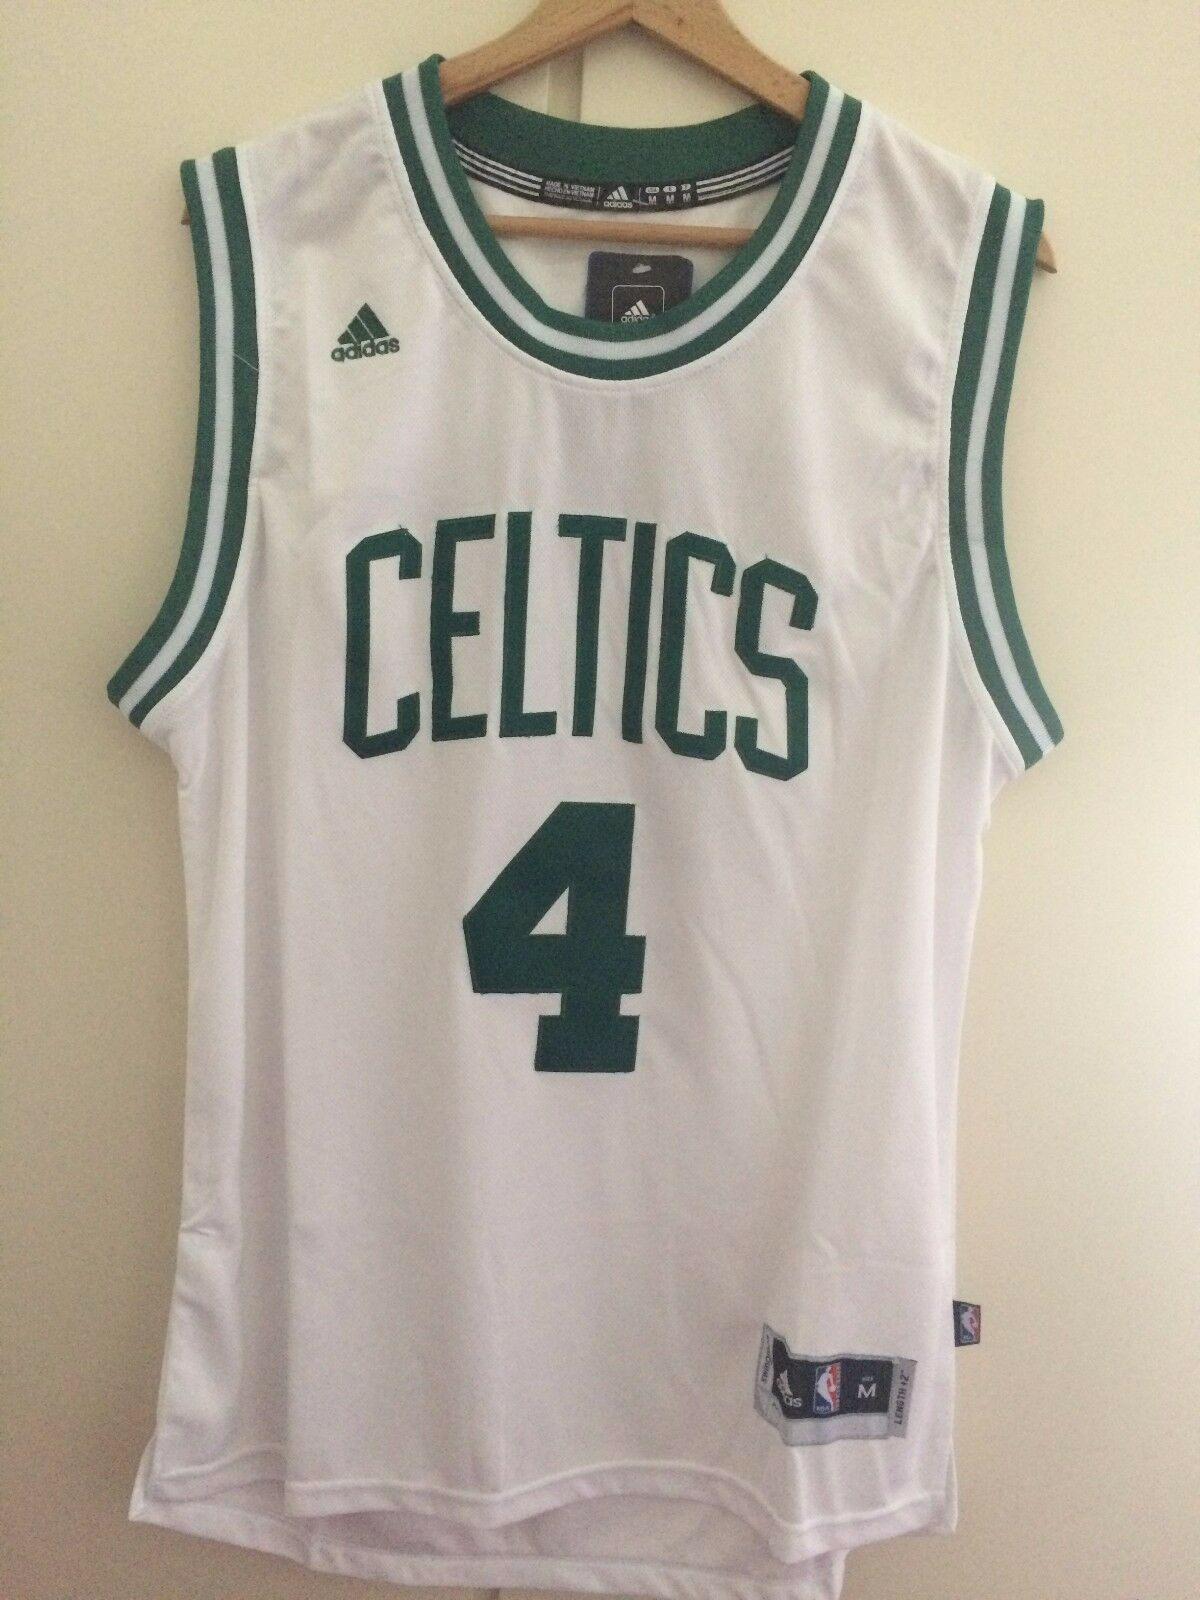 Tank top nba basketball jersey t-shirt Isaiah Thomas shirt Boston Celtics S   M